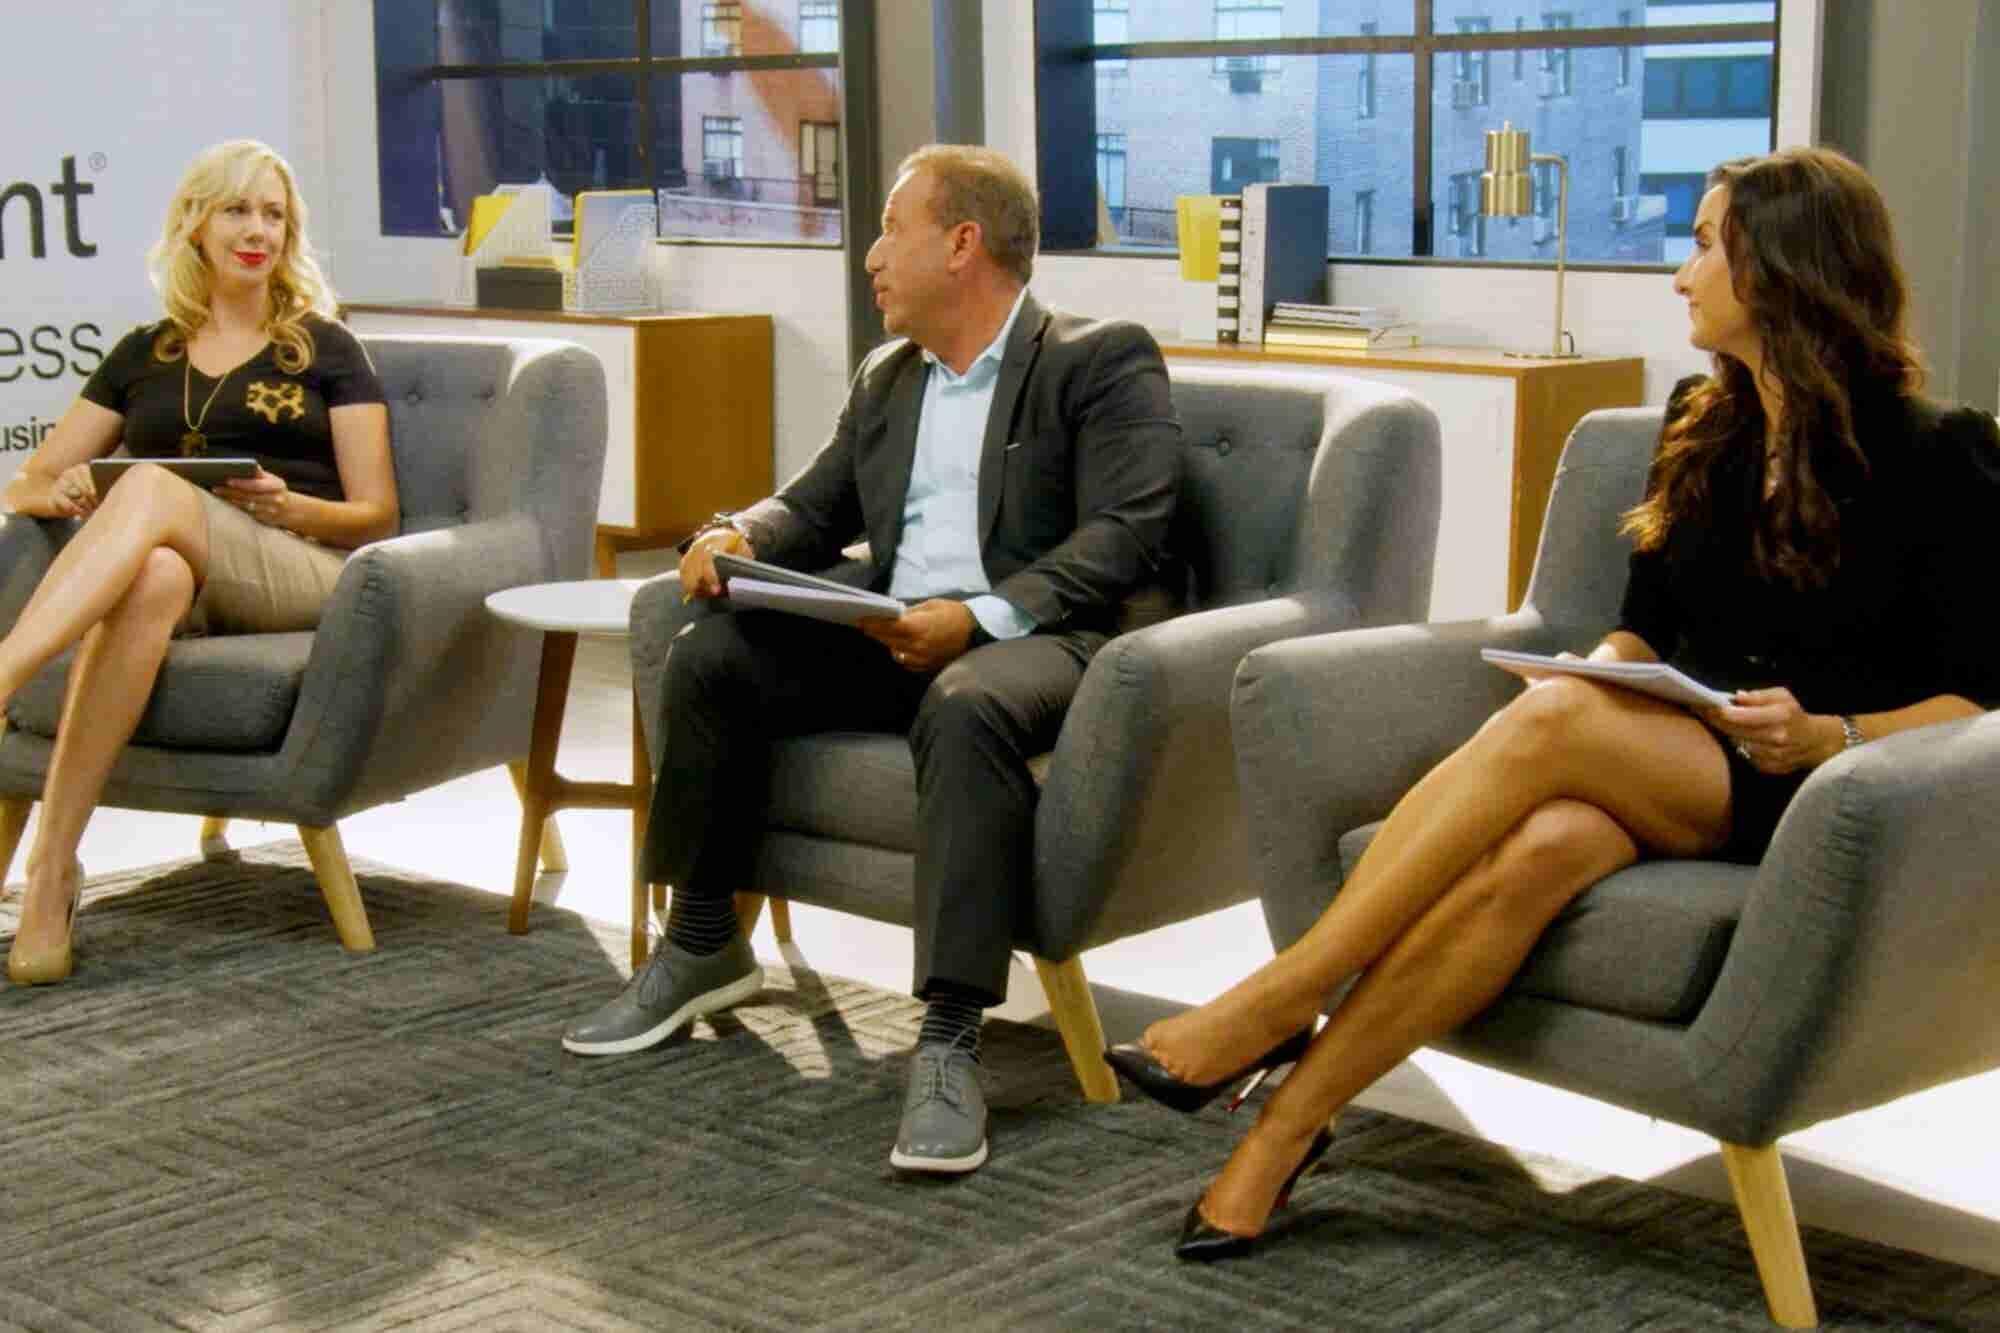 Entrepreneur Elevator Pitch Season 3 Episode 1: 'Is She Pitc...